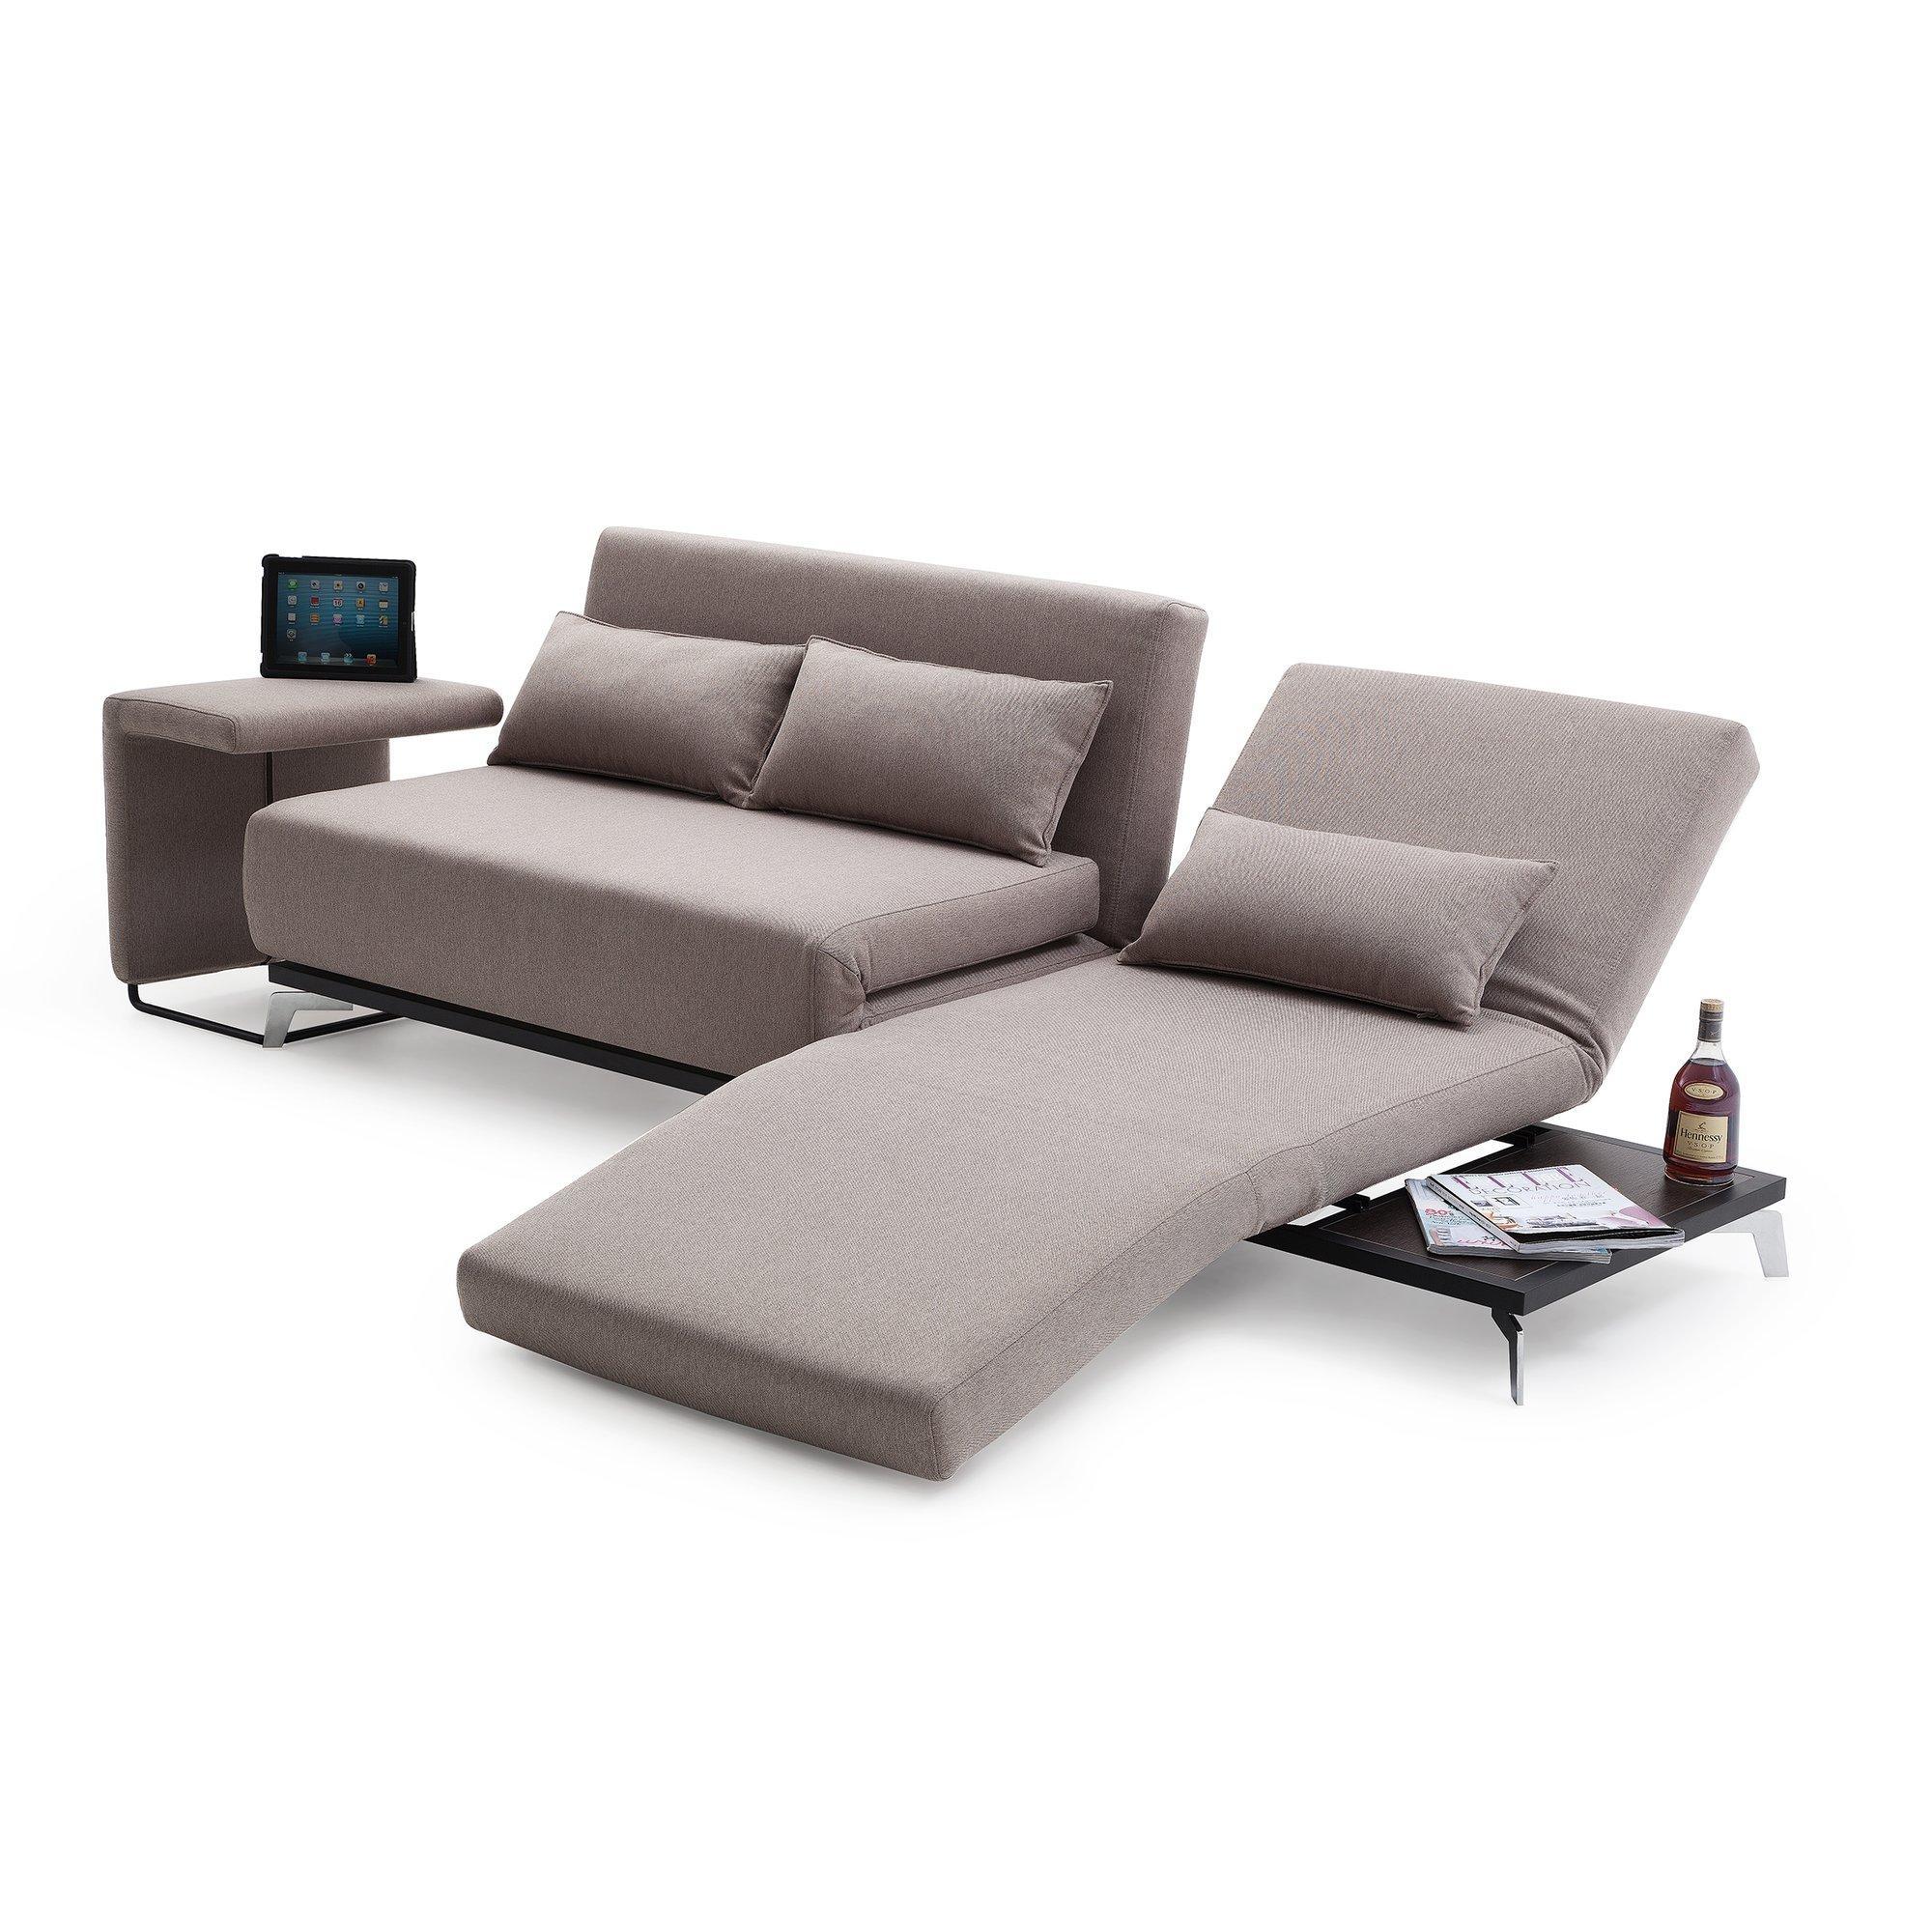 Sofas Center : Target Sleeper Sofa Sheetstarget Bedtarget Sheets Within Sleeper Sofa Sheets (Image 20 of 20)